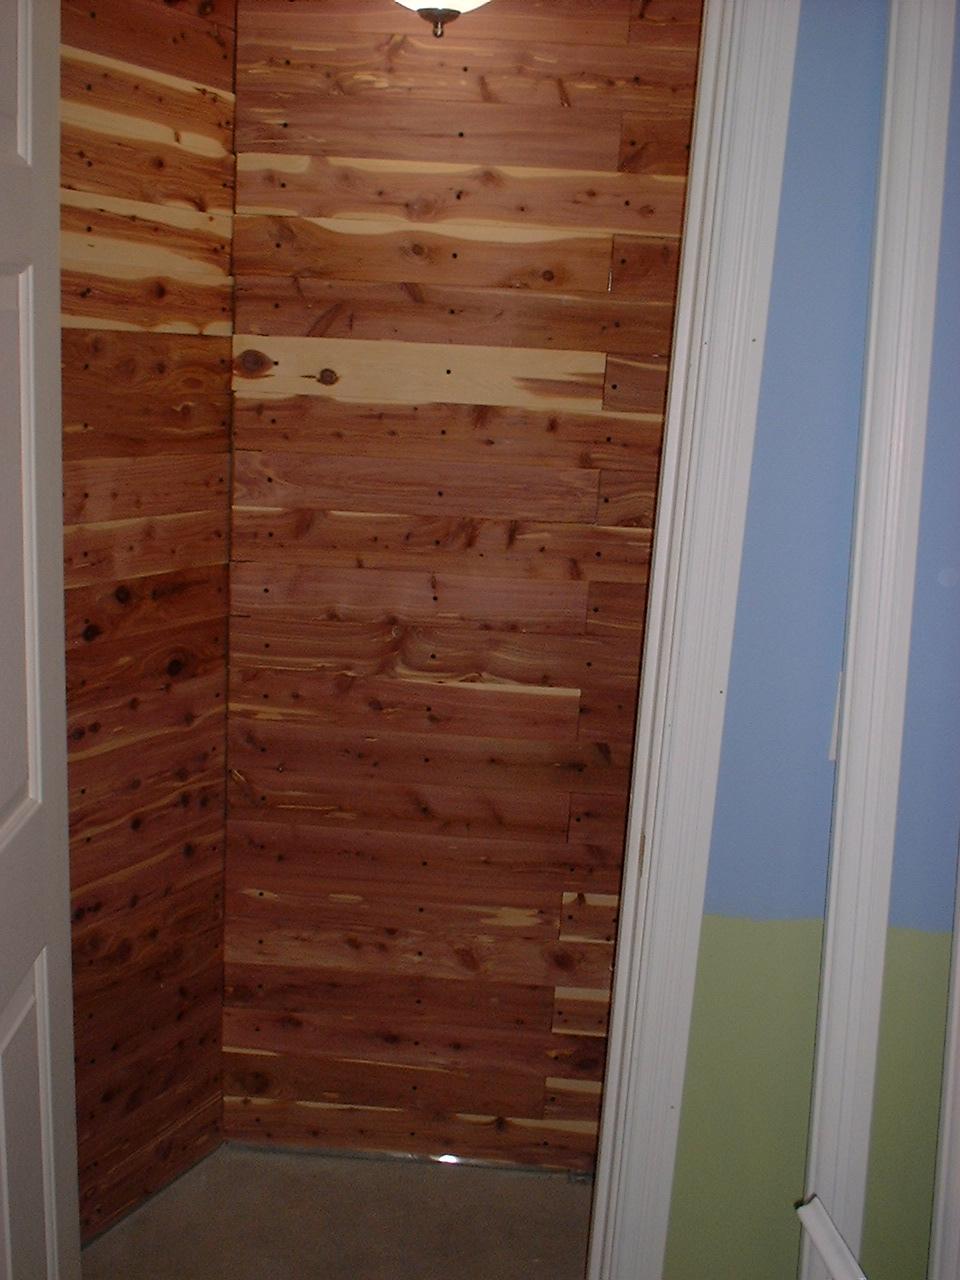 Cedar Closets 3 Nails 4 U Construction: Websites And Digital Design For The Masses